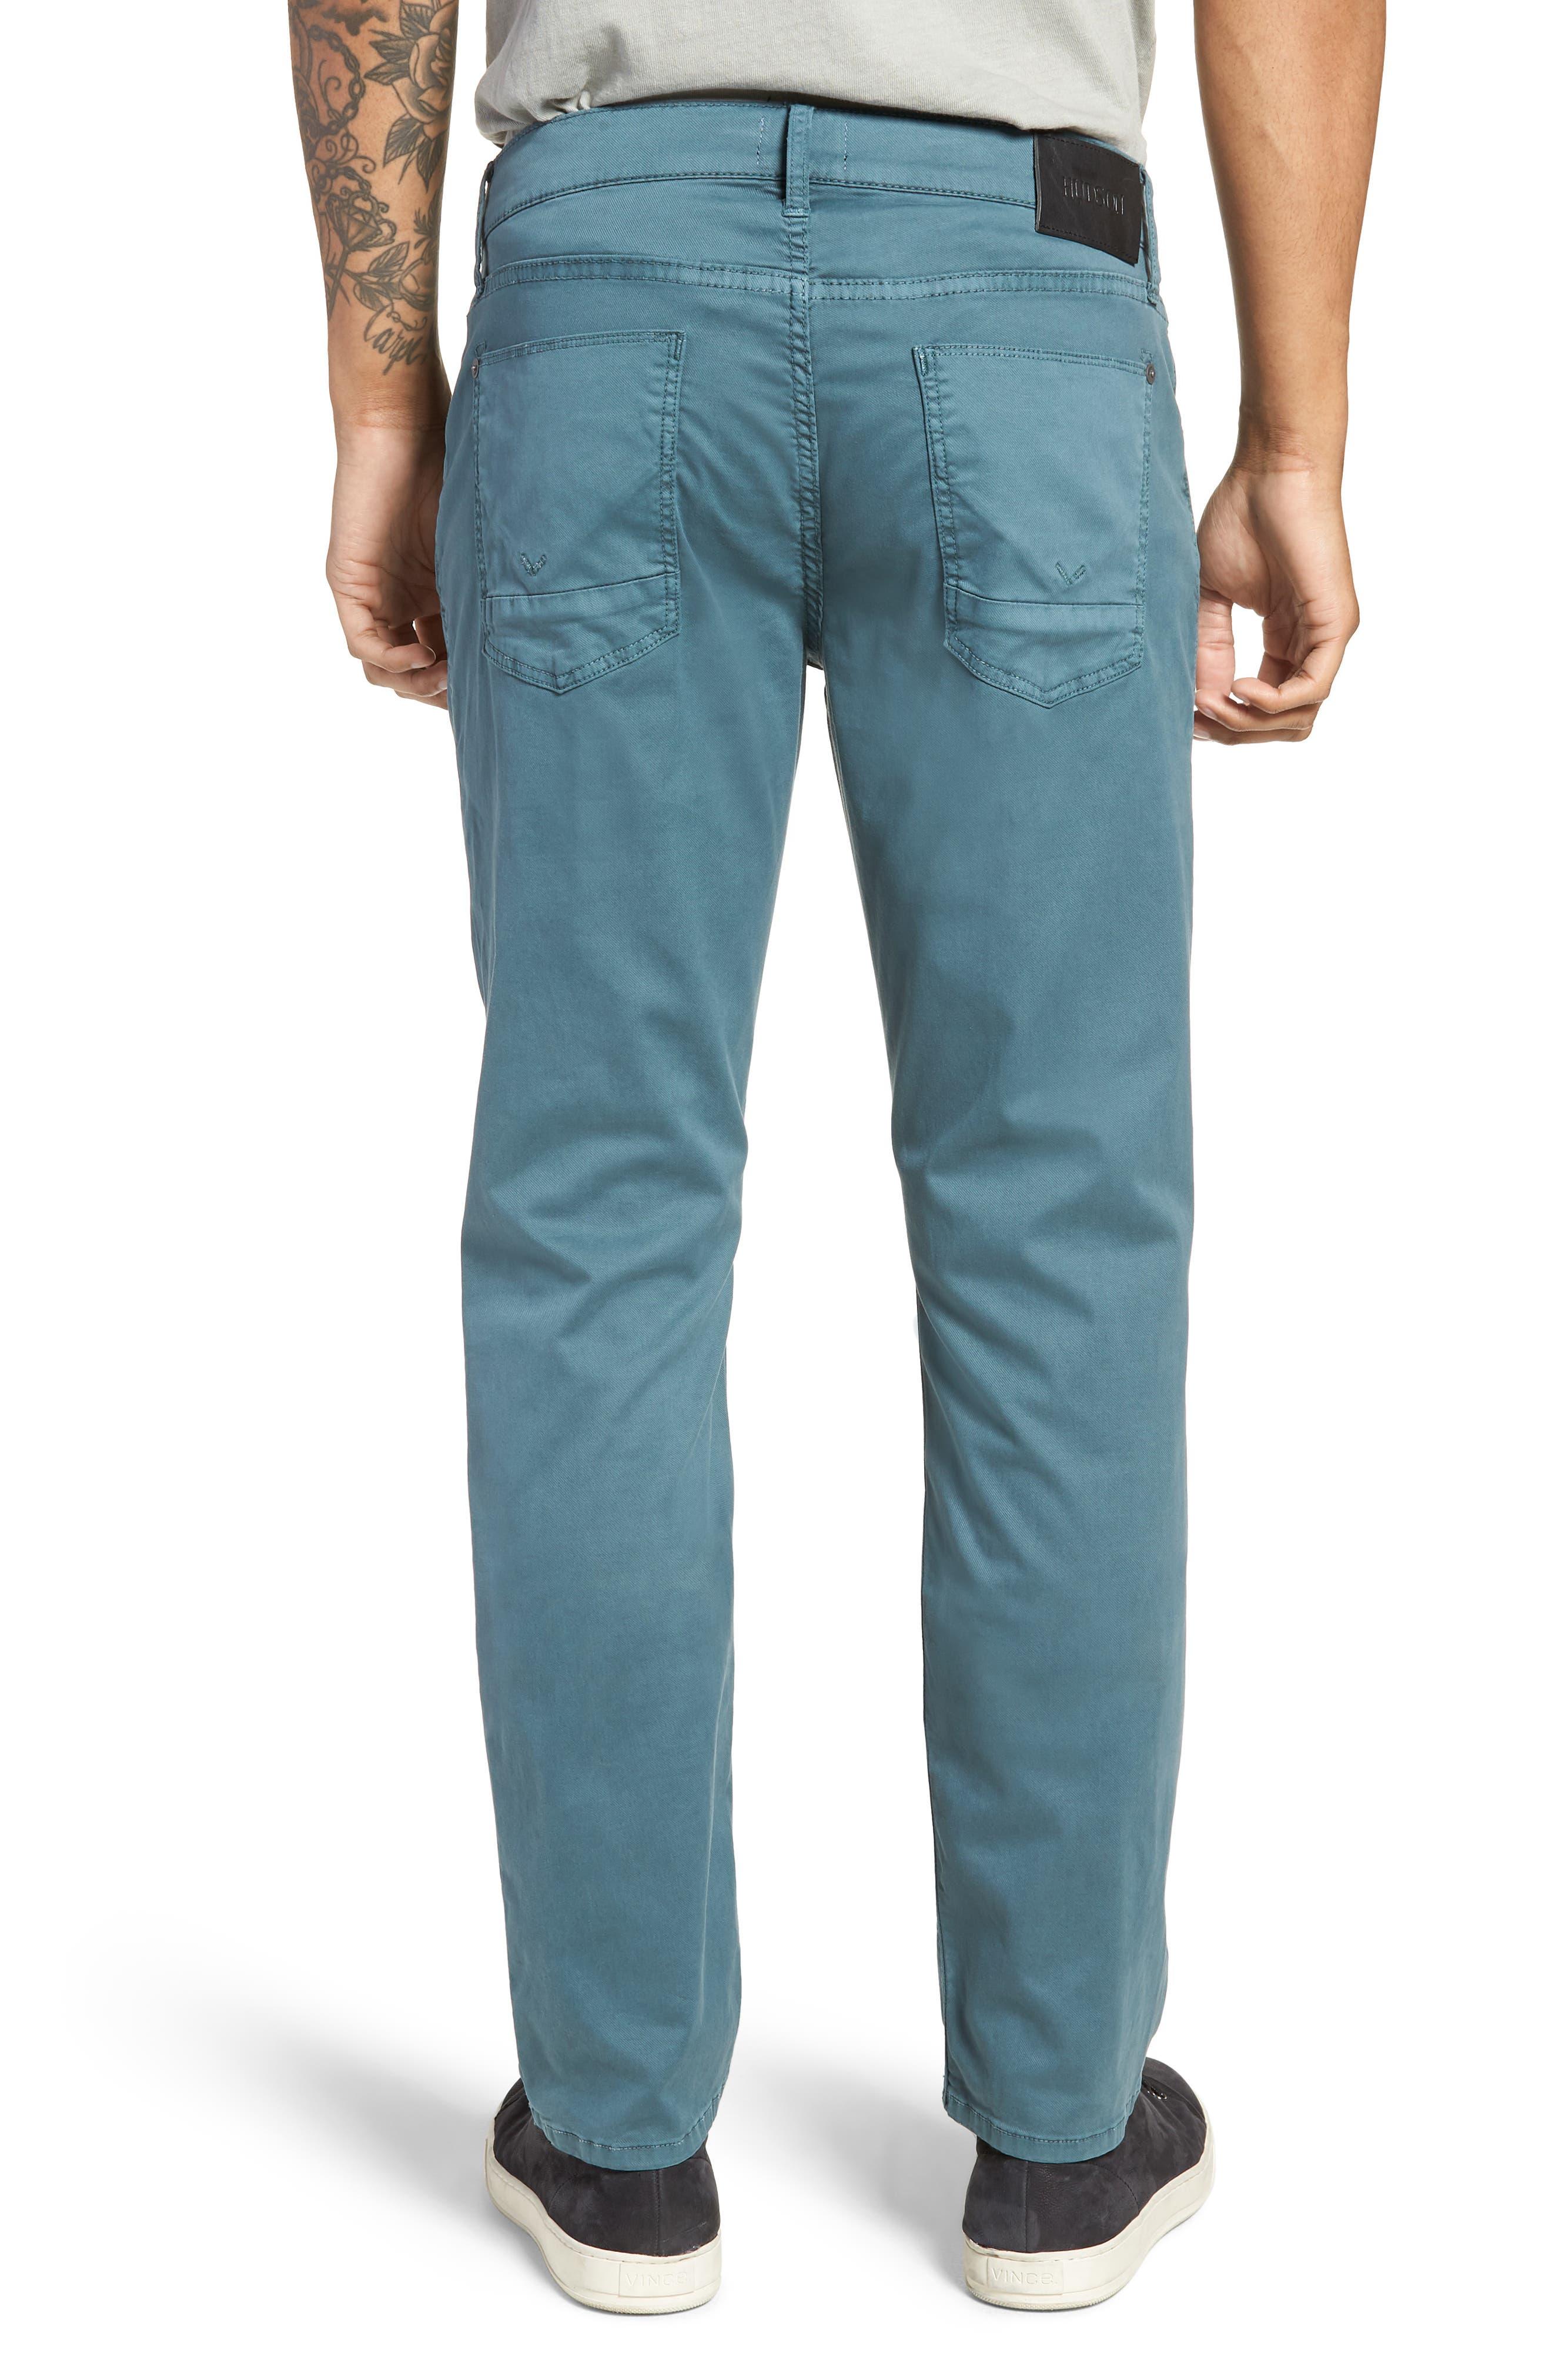 Blake Slim Fit Jeans,                             Alternate thumbnail 2, color,                             Ocean